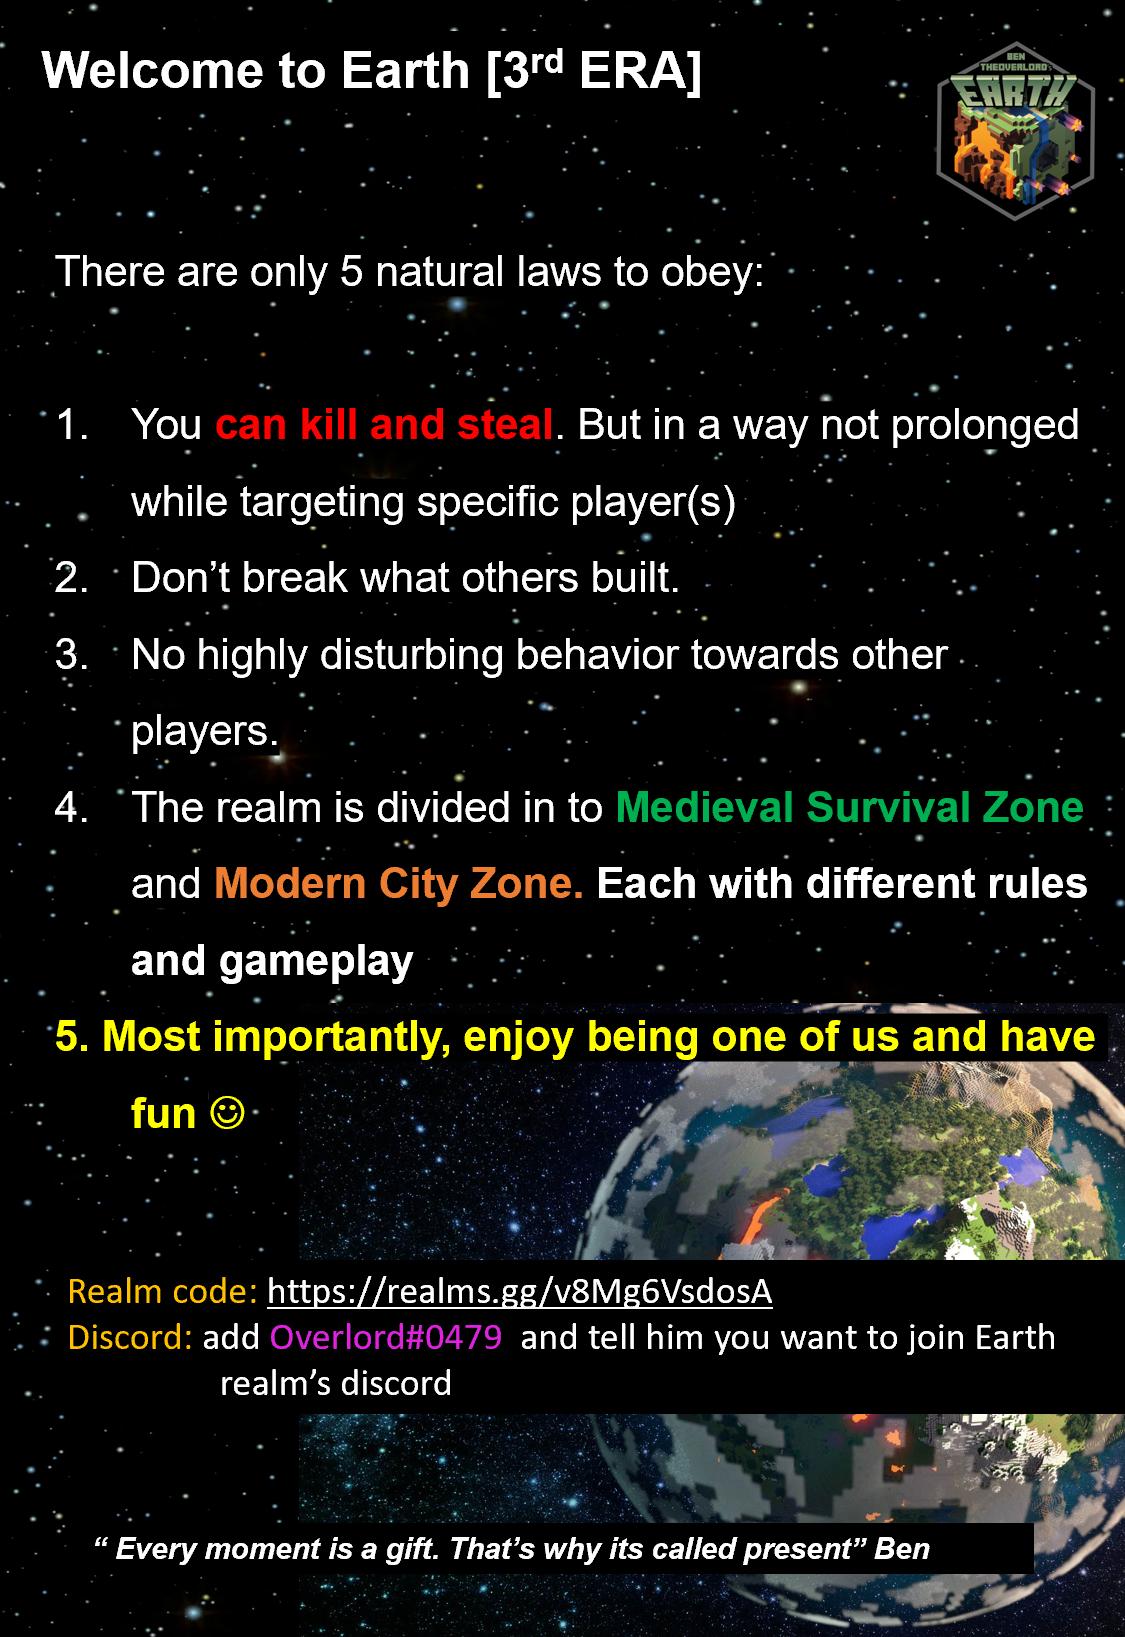 War][Settlement][Trade][Add ons] Earth Realm 3rd Era